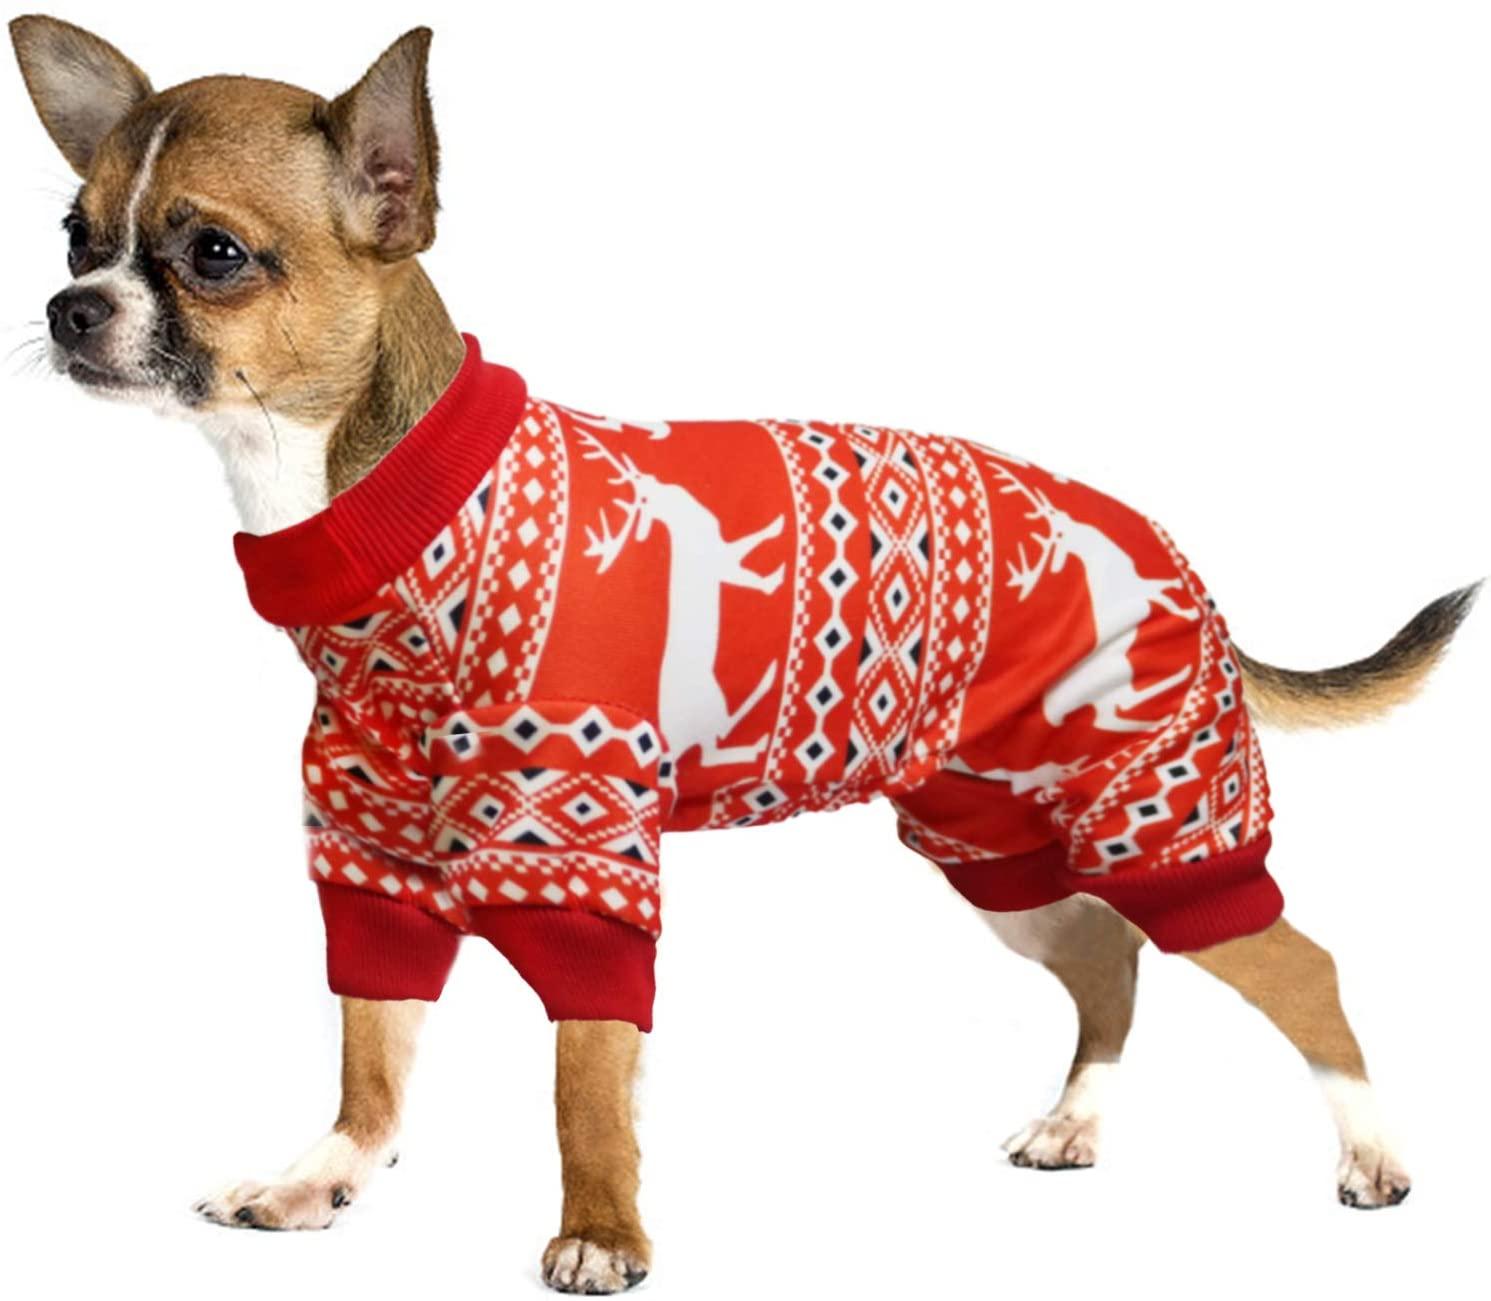 BWOGUE Christmas Elk Dog Pajamas Pet Clothes Jumpsuit Apparel Xmas Cat Costumes Onesies Soft Christmas PJS Santa Reindeer